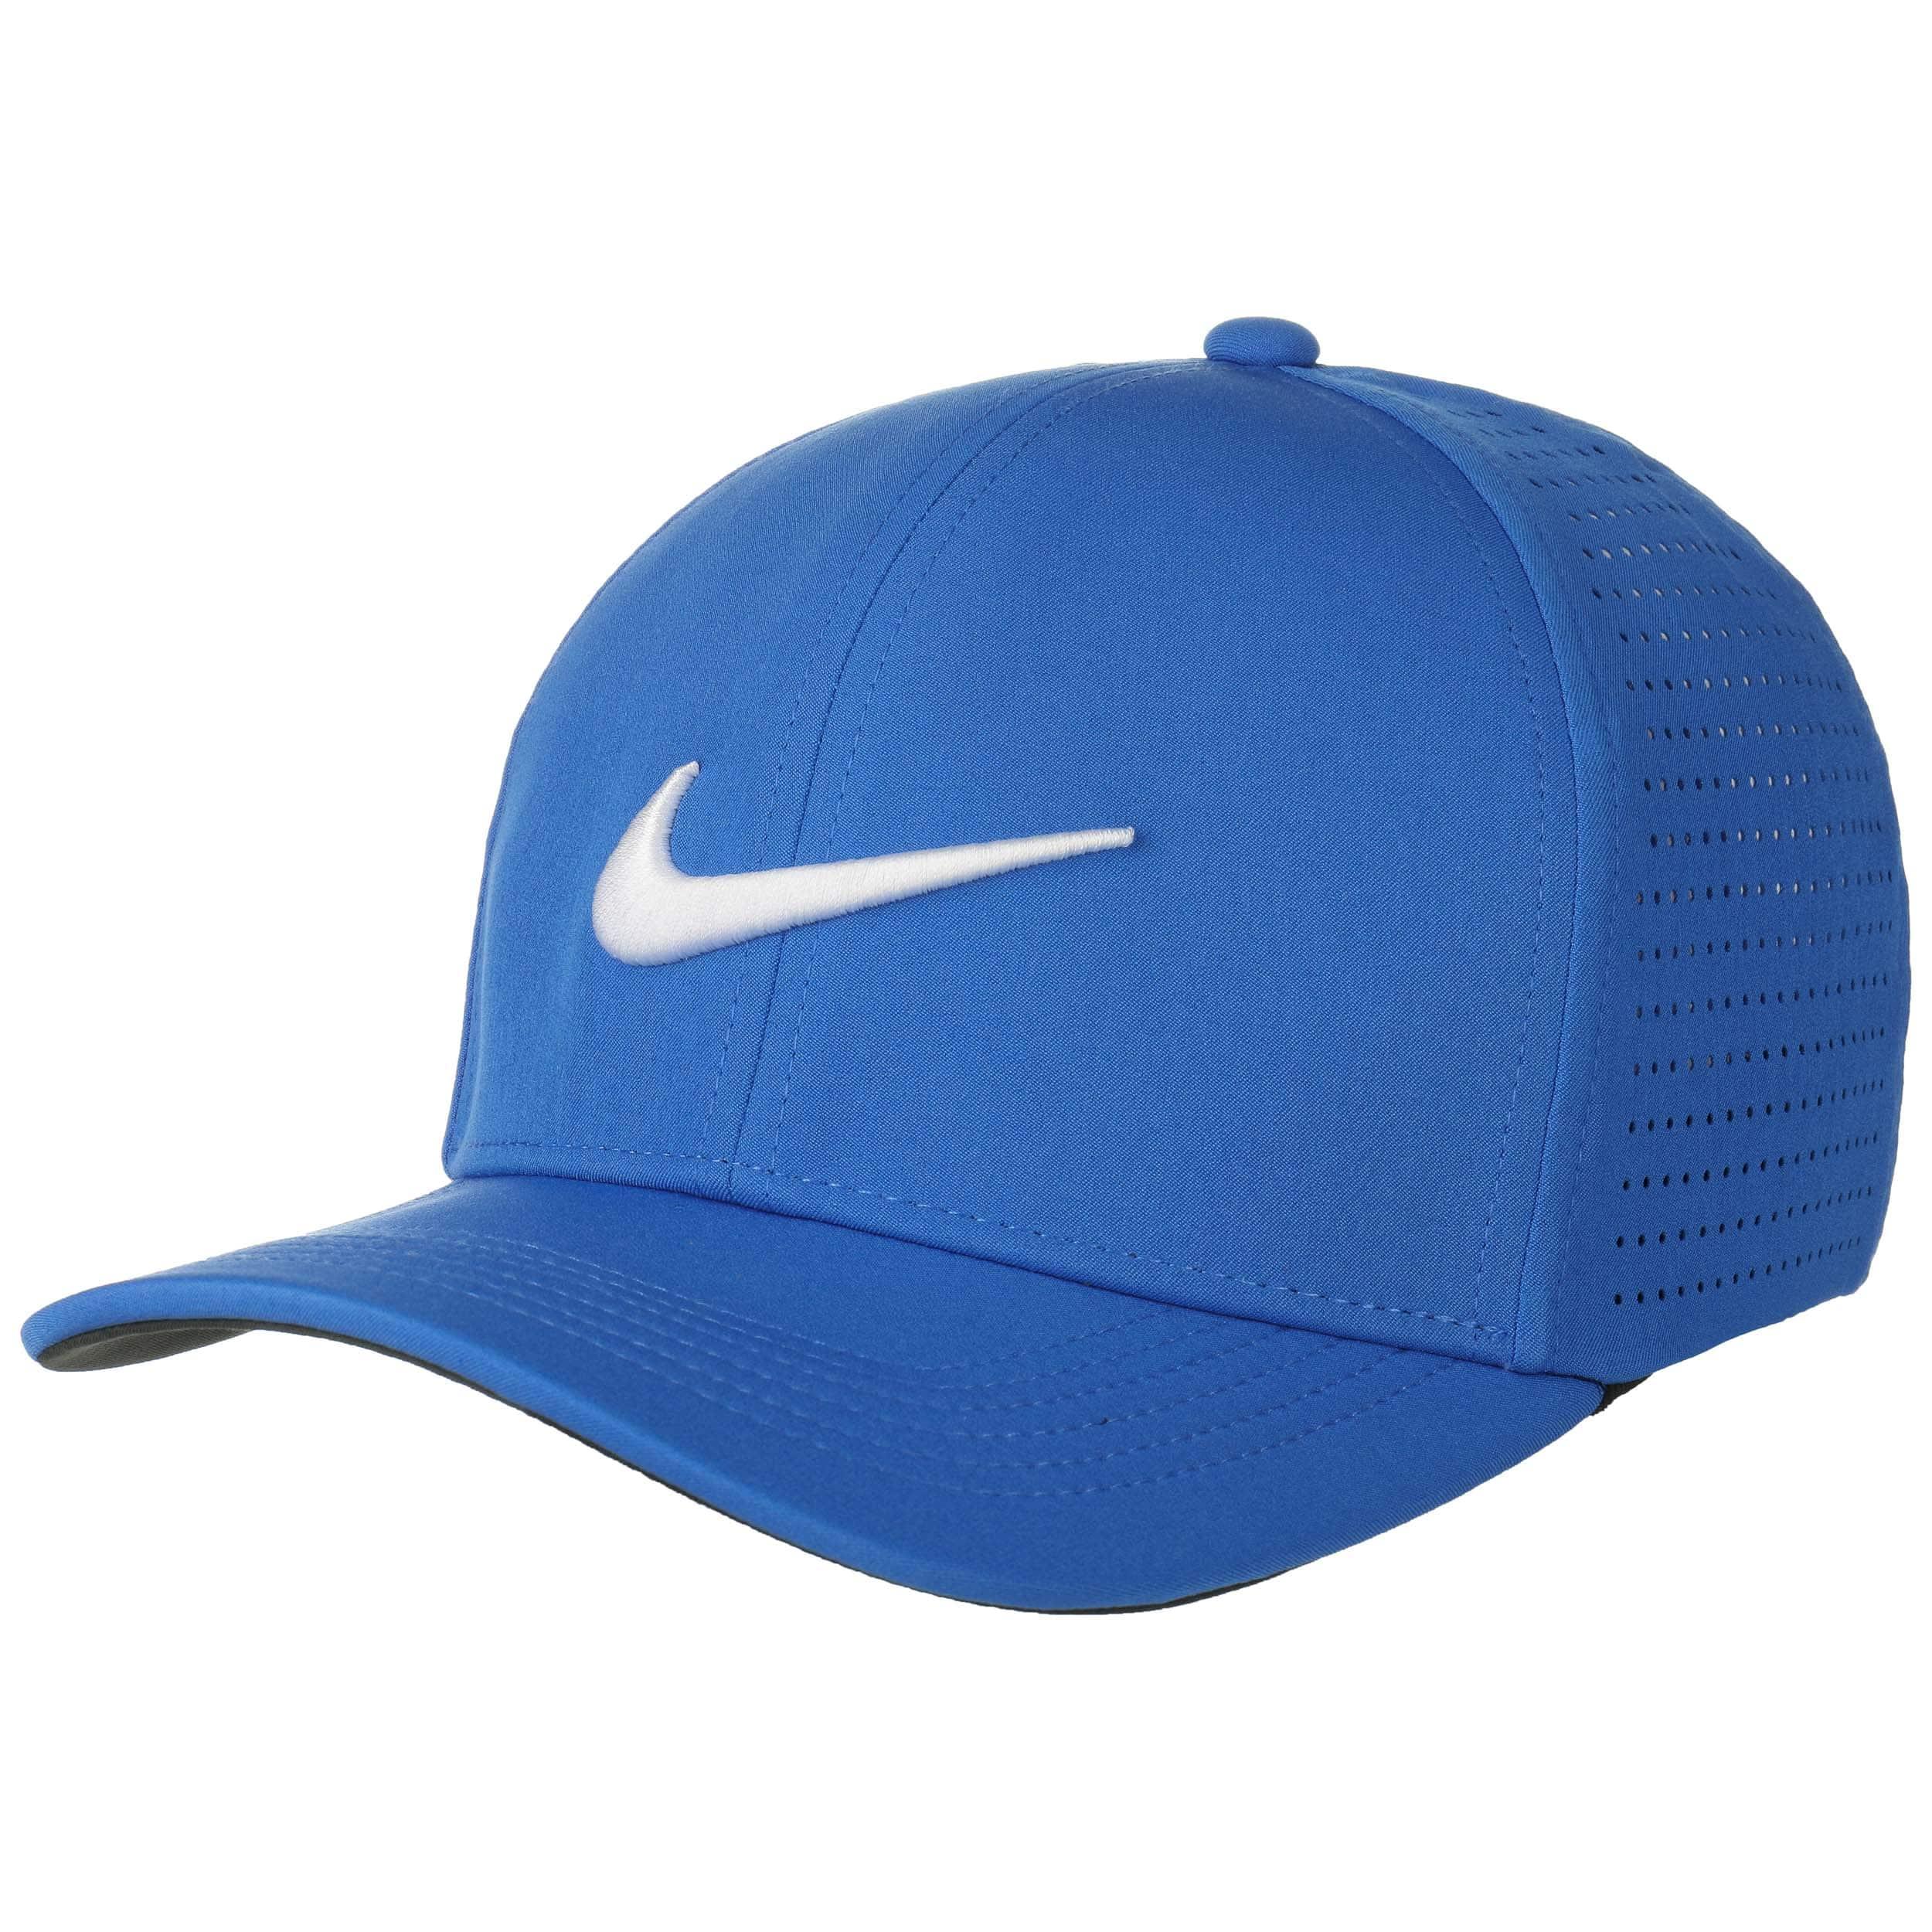 98a0263c8e4 ... Golf Classic 99 Baseball Cap by Nike - blue 2 ...